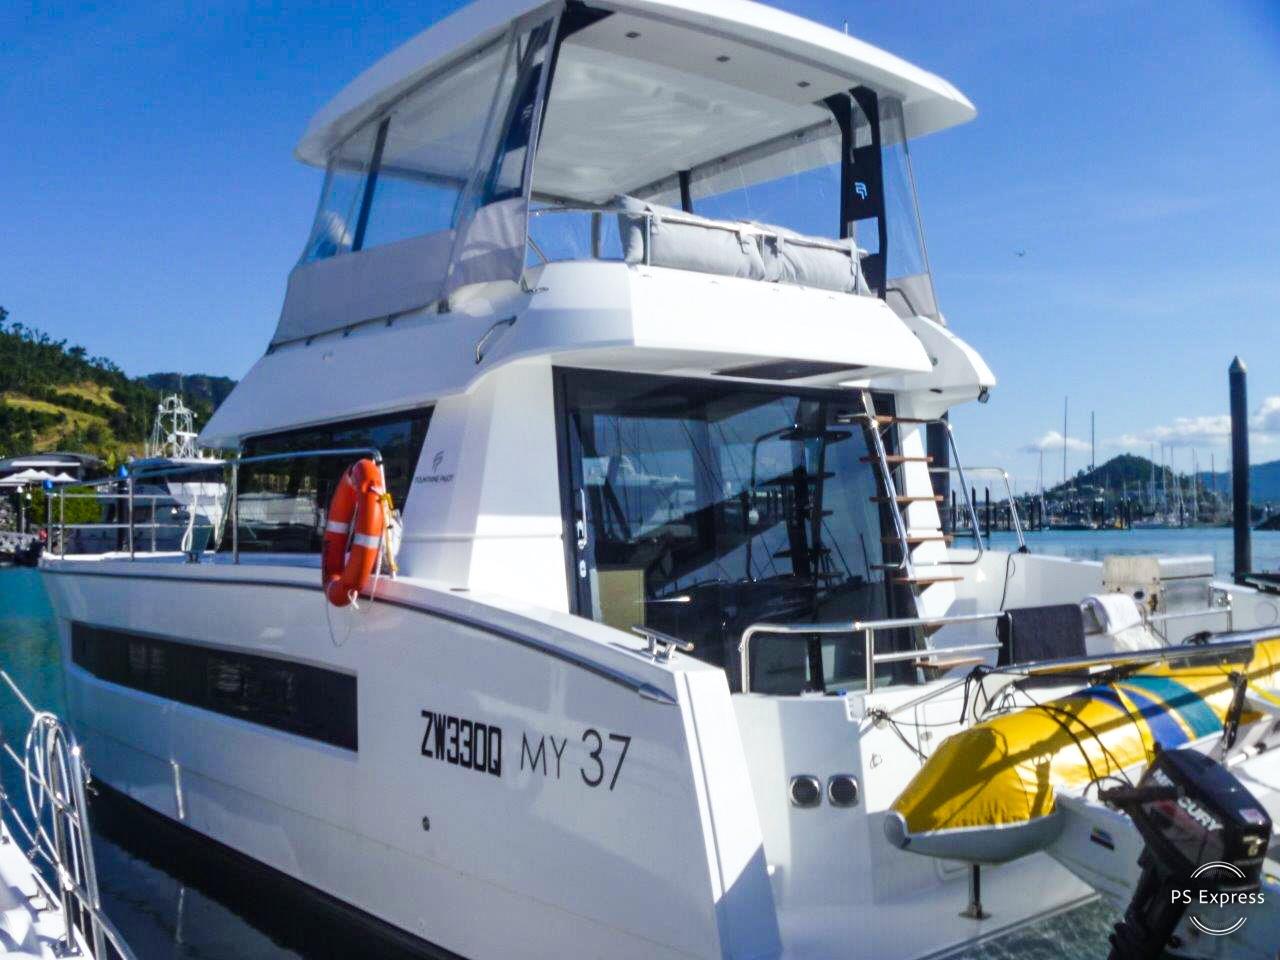 Powered Catamaran Motor Yacht 37 With A/C